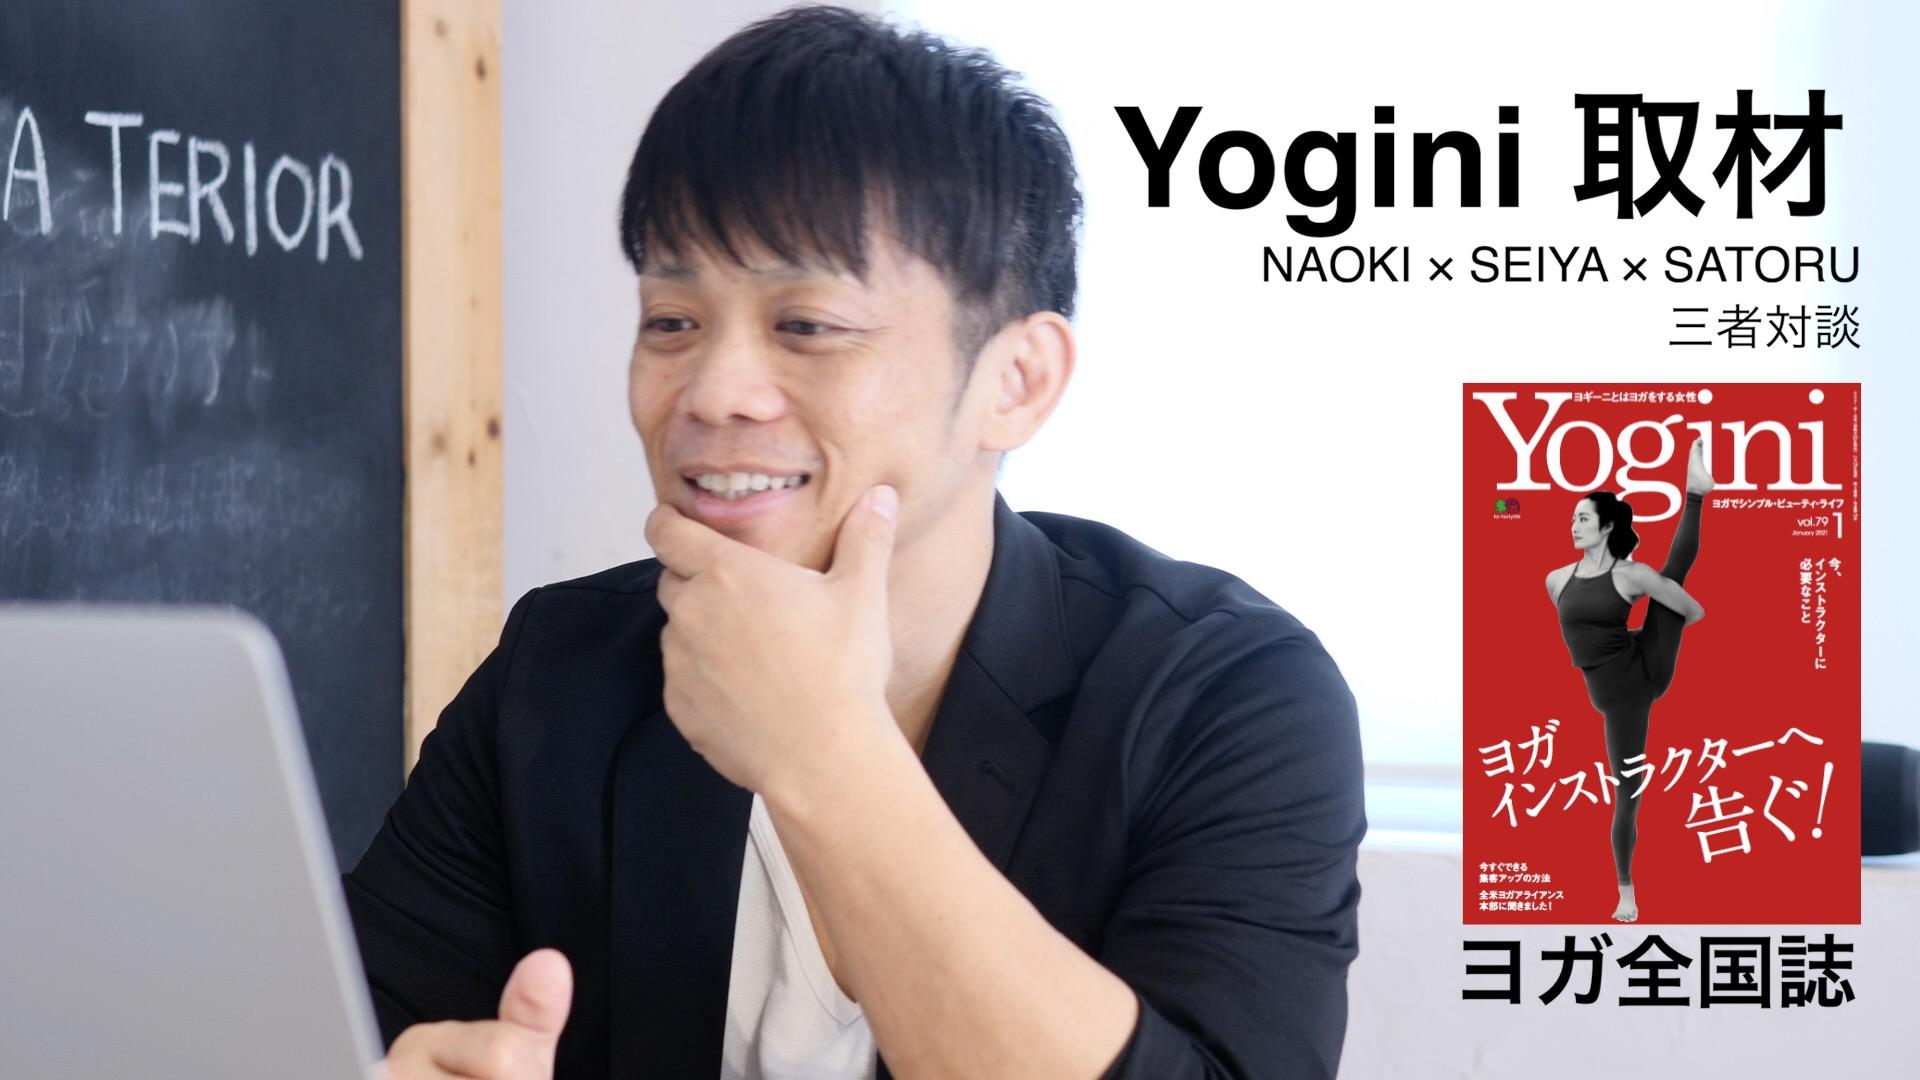 YOGINI取材アイキャッチ